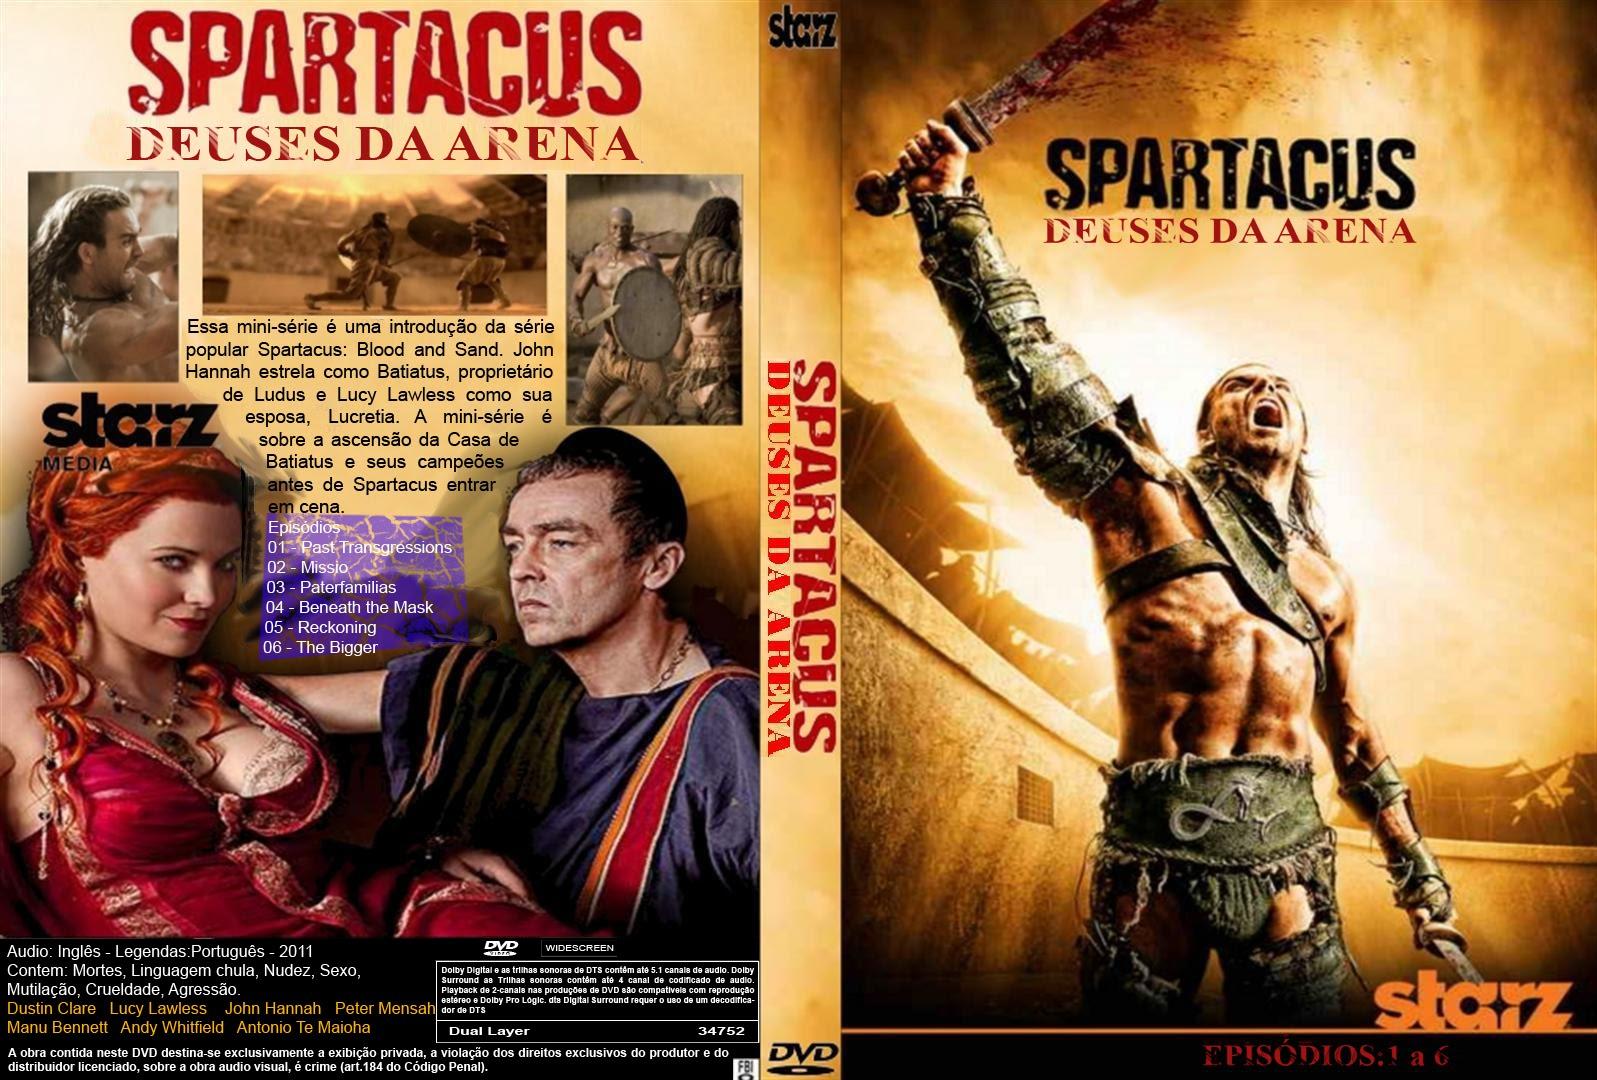 Filme Spartacus within spartacus deuses da arena episódios 1 a 6 - capas covers - capas